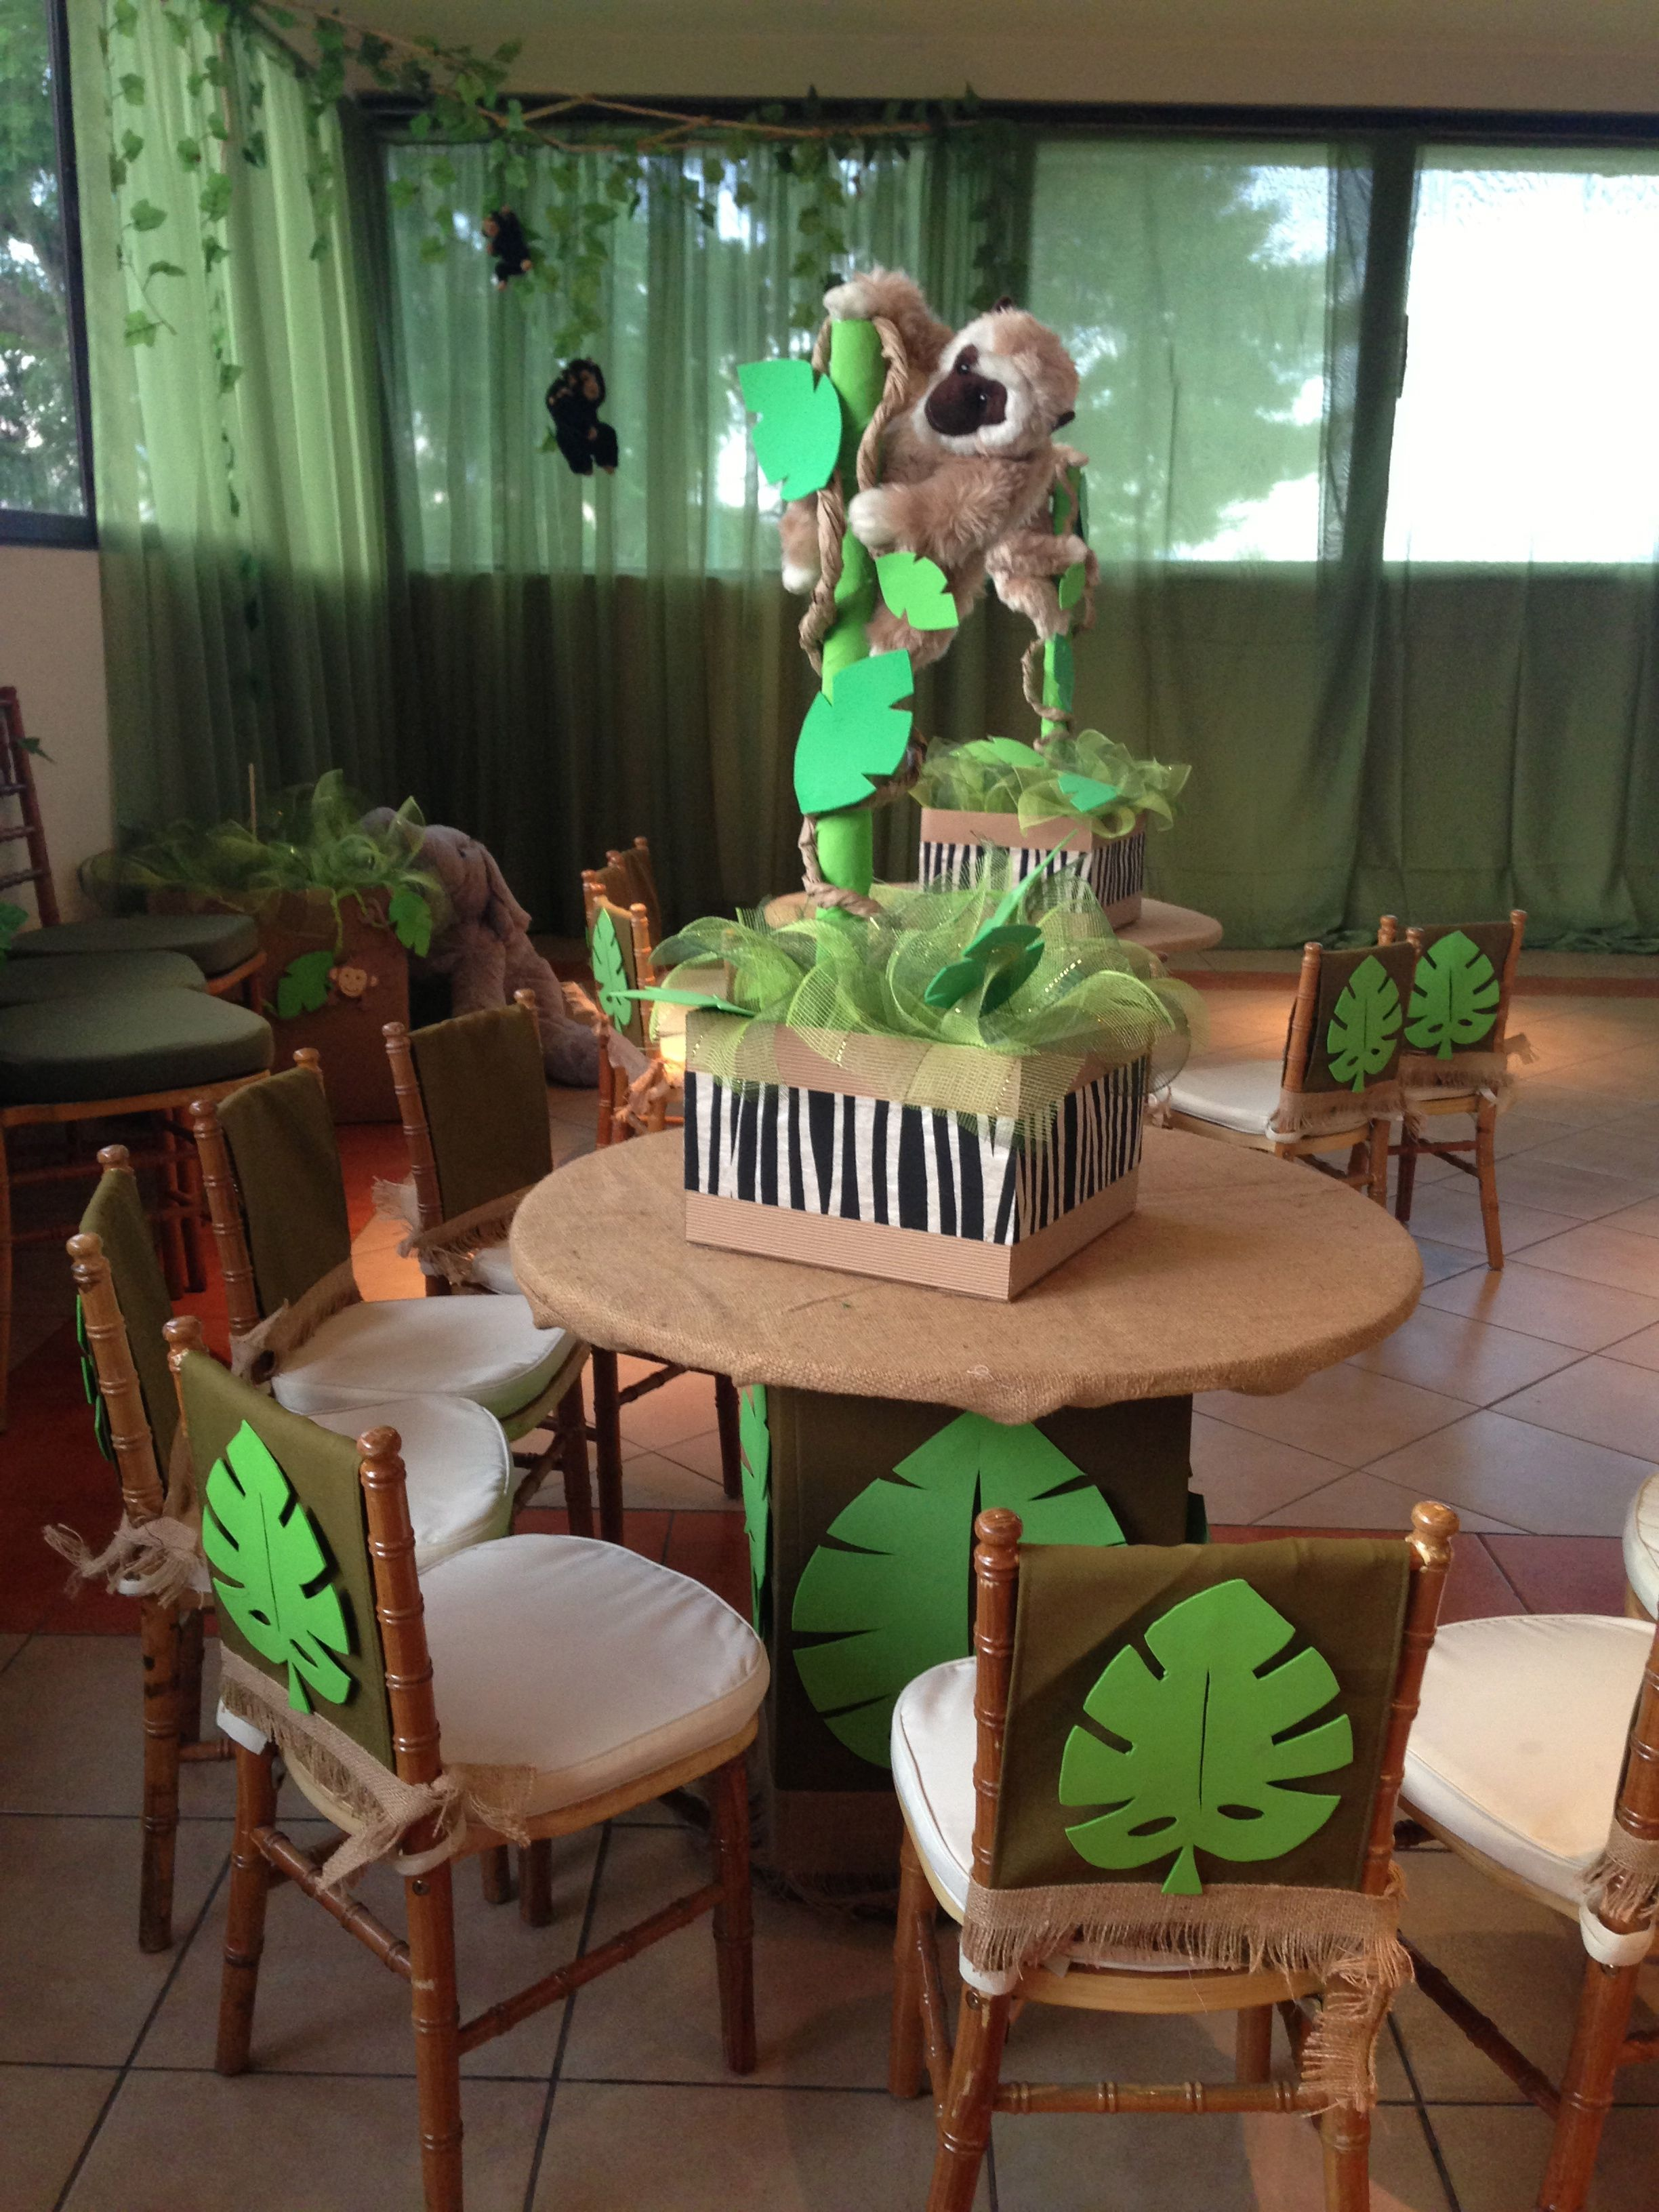 Decoracion infantil fiesta jungla eventos by bsquare - Decoracion fiesta infantil ...